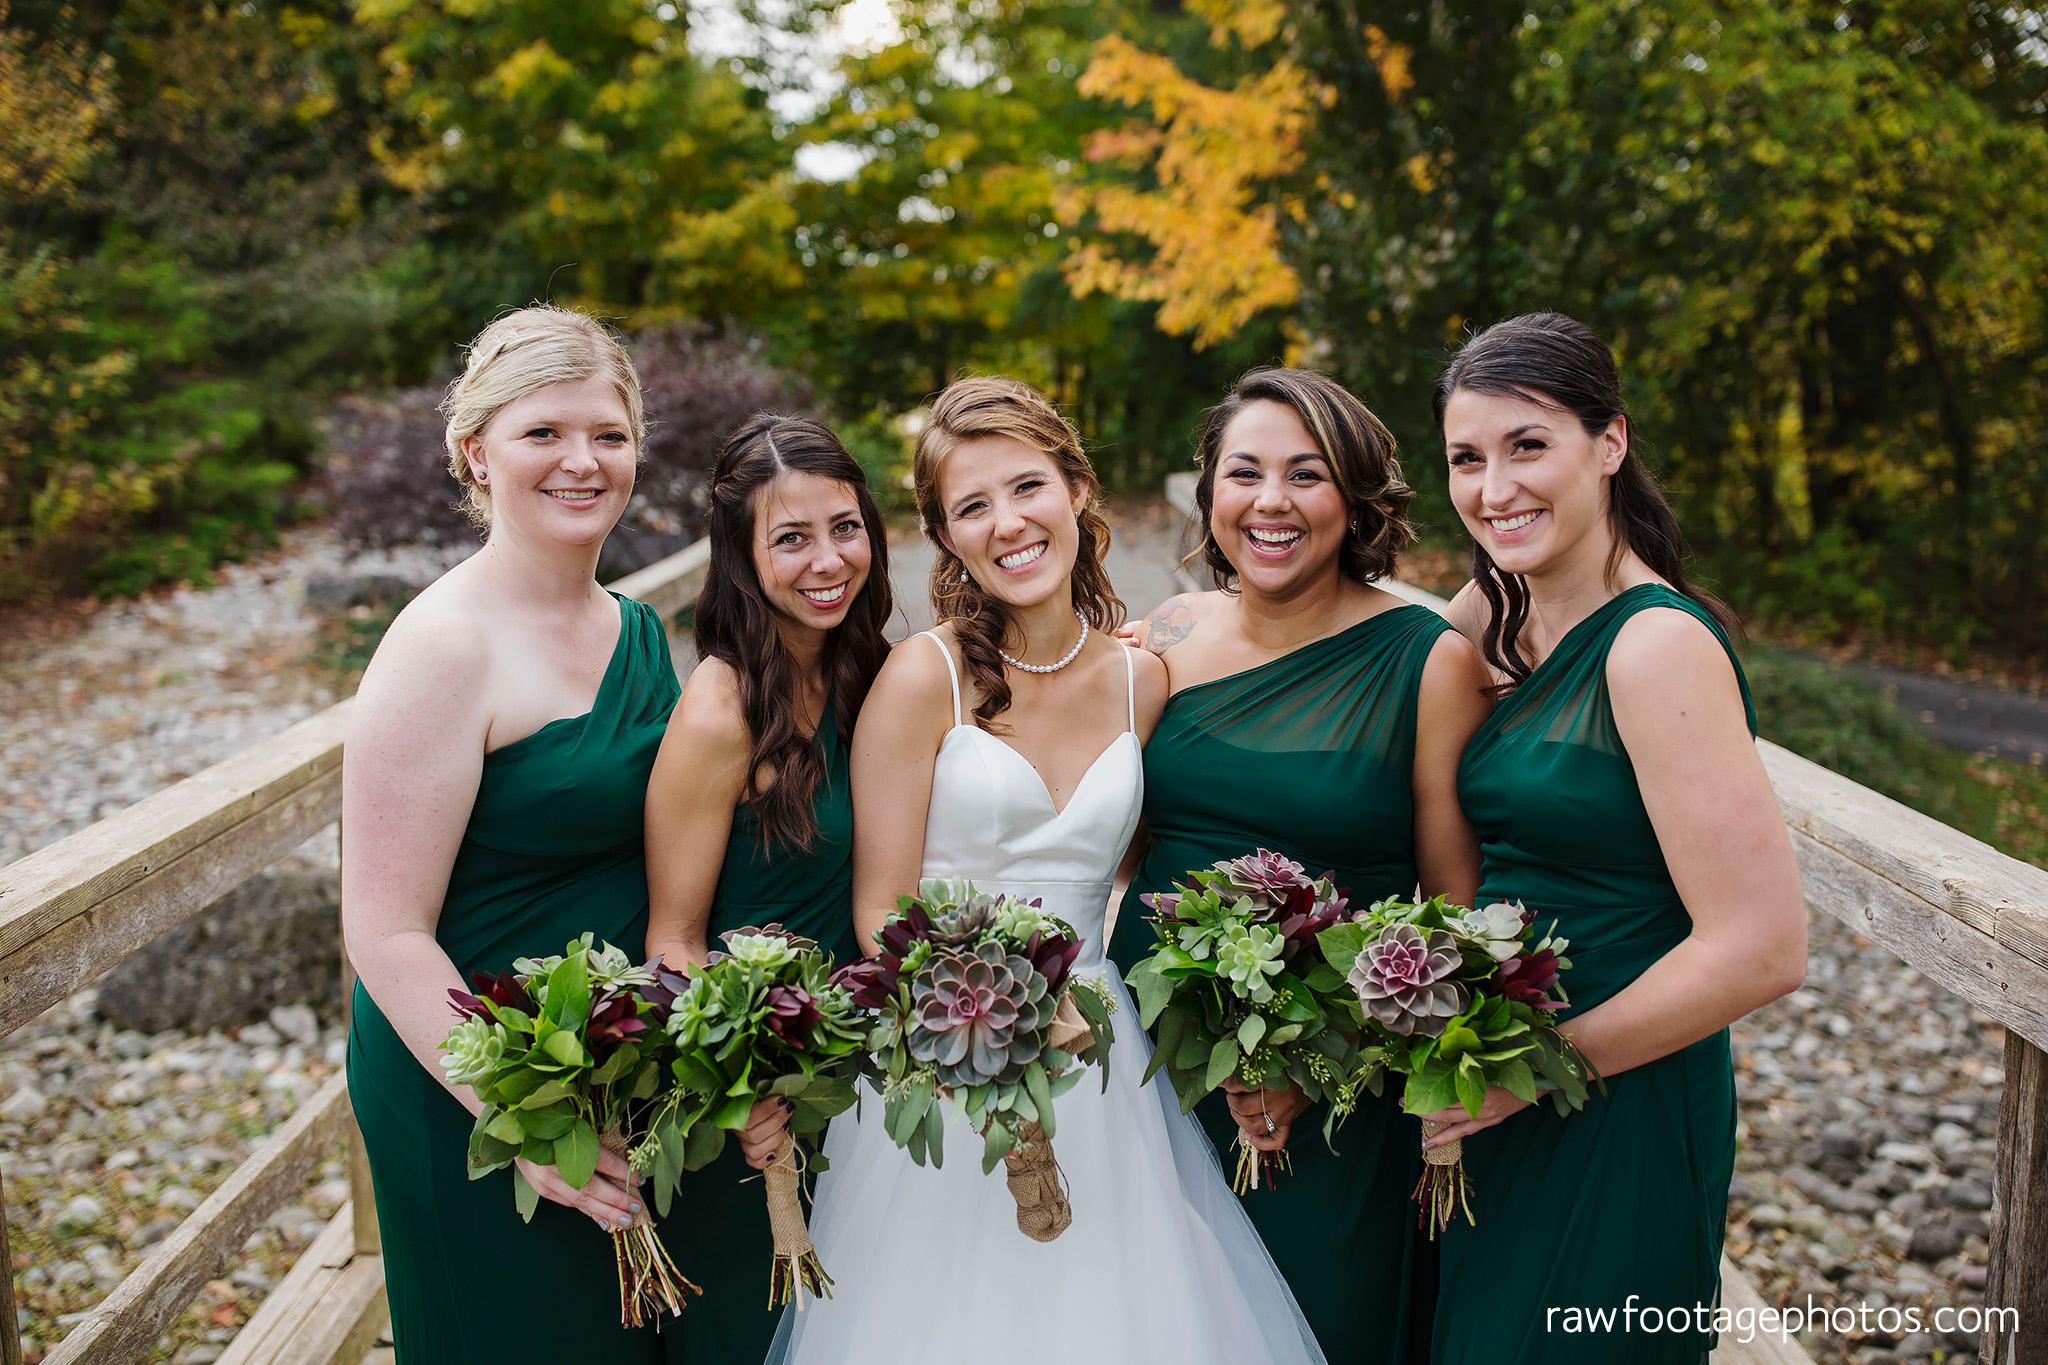 london_ontario_wedding_photographer-civic_gardens-springbank_park-succulent_bouquet-fall_wedding-bridge-raw_footage_photography047.jpg